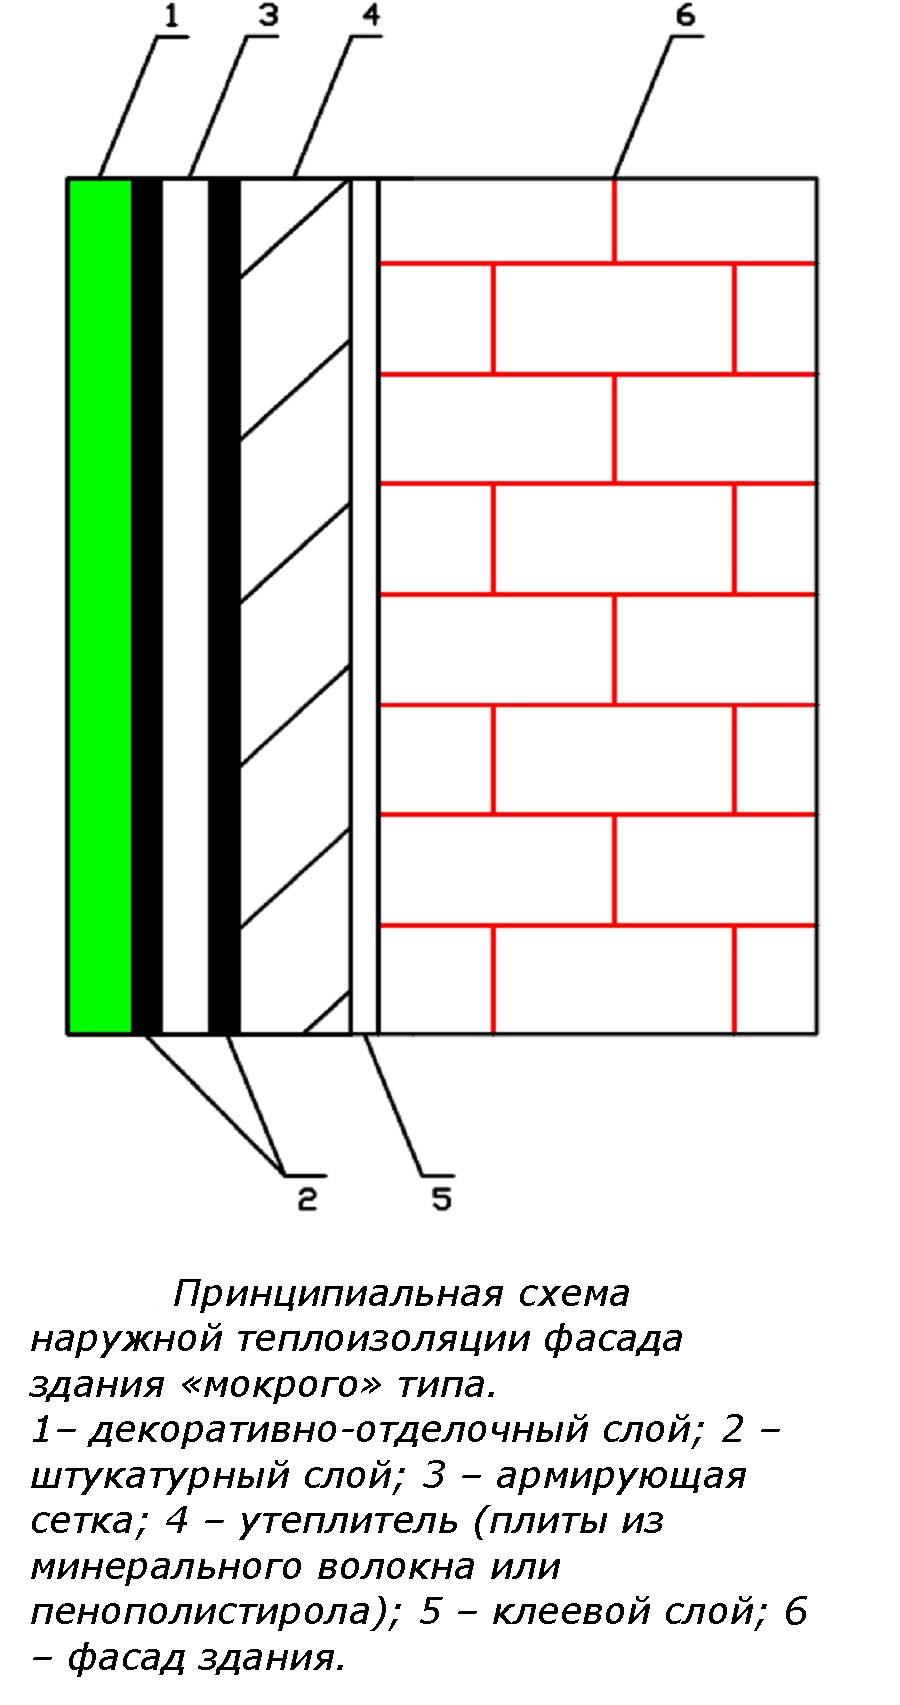 мокрый фасад схема